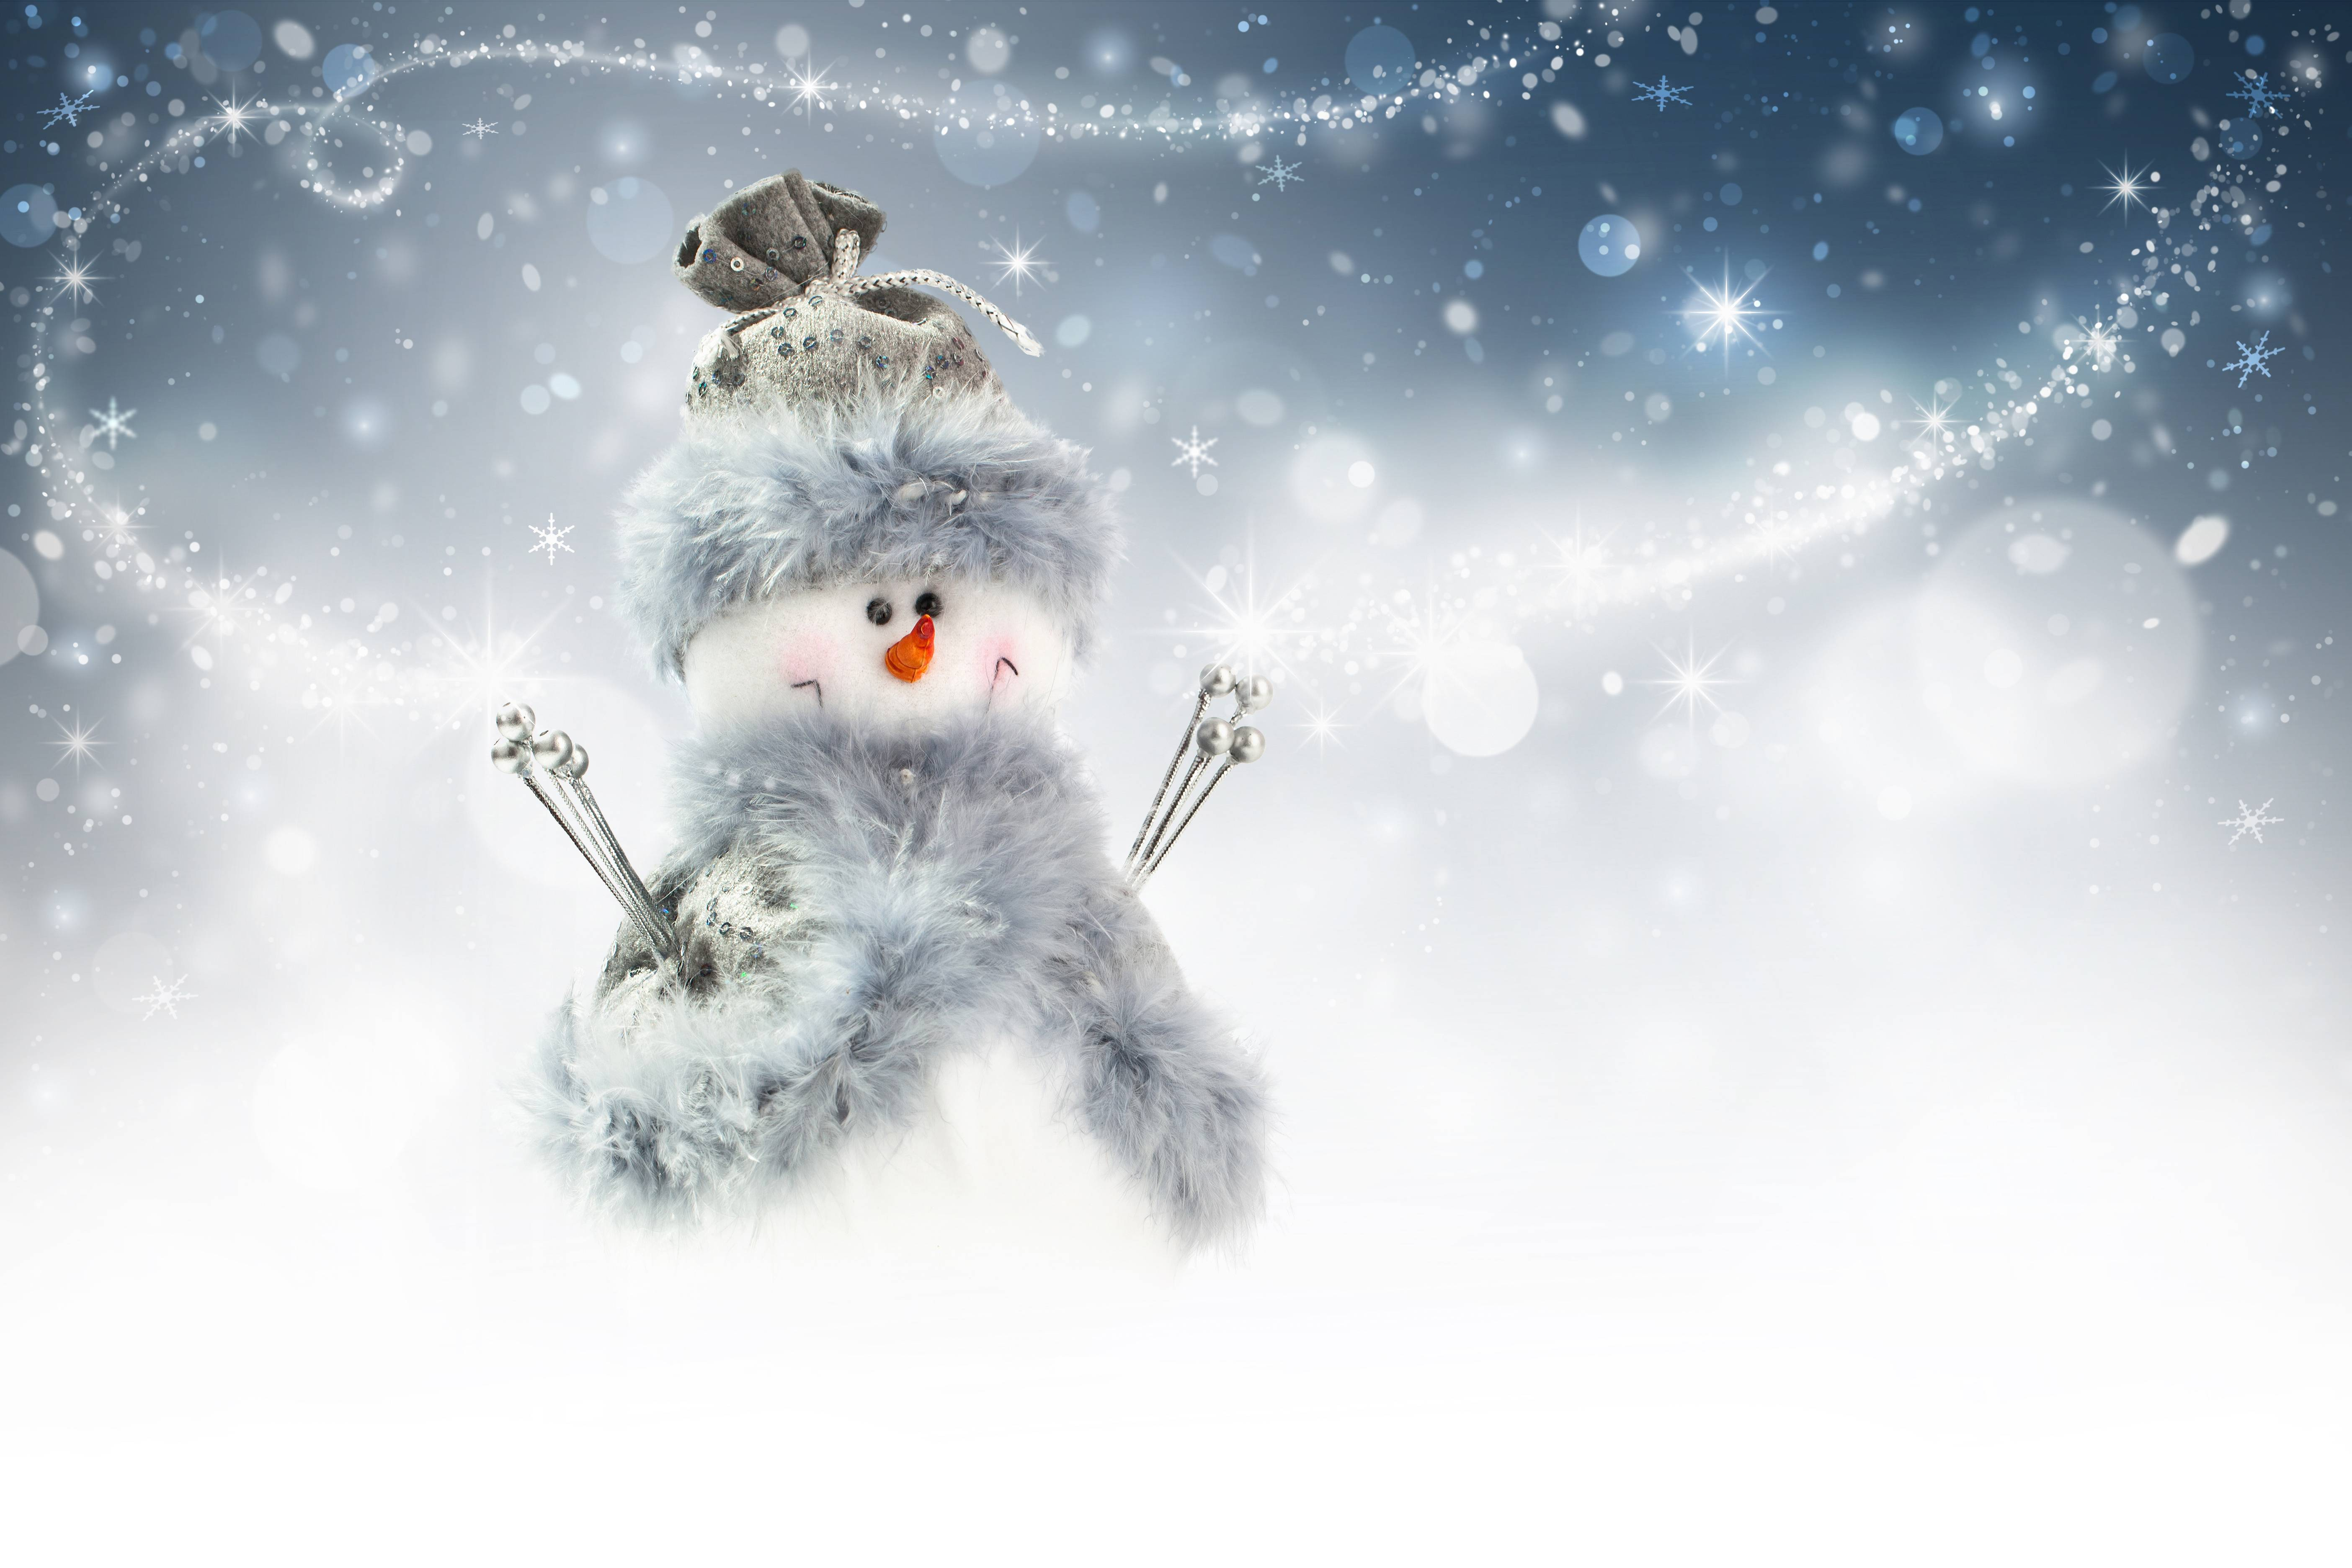 snowman desktop background-#25